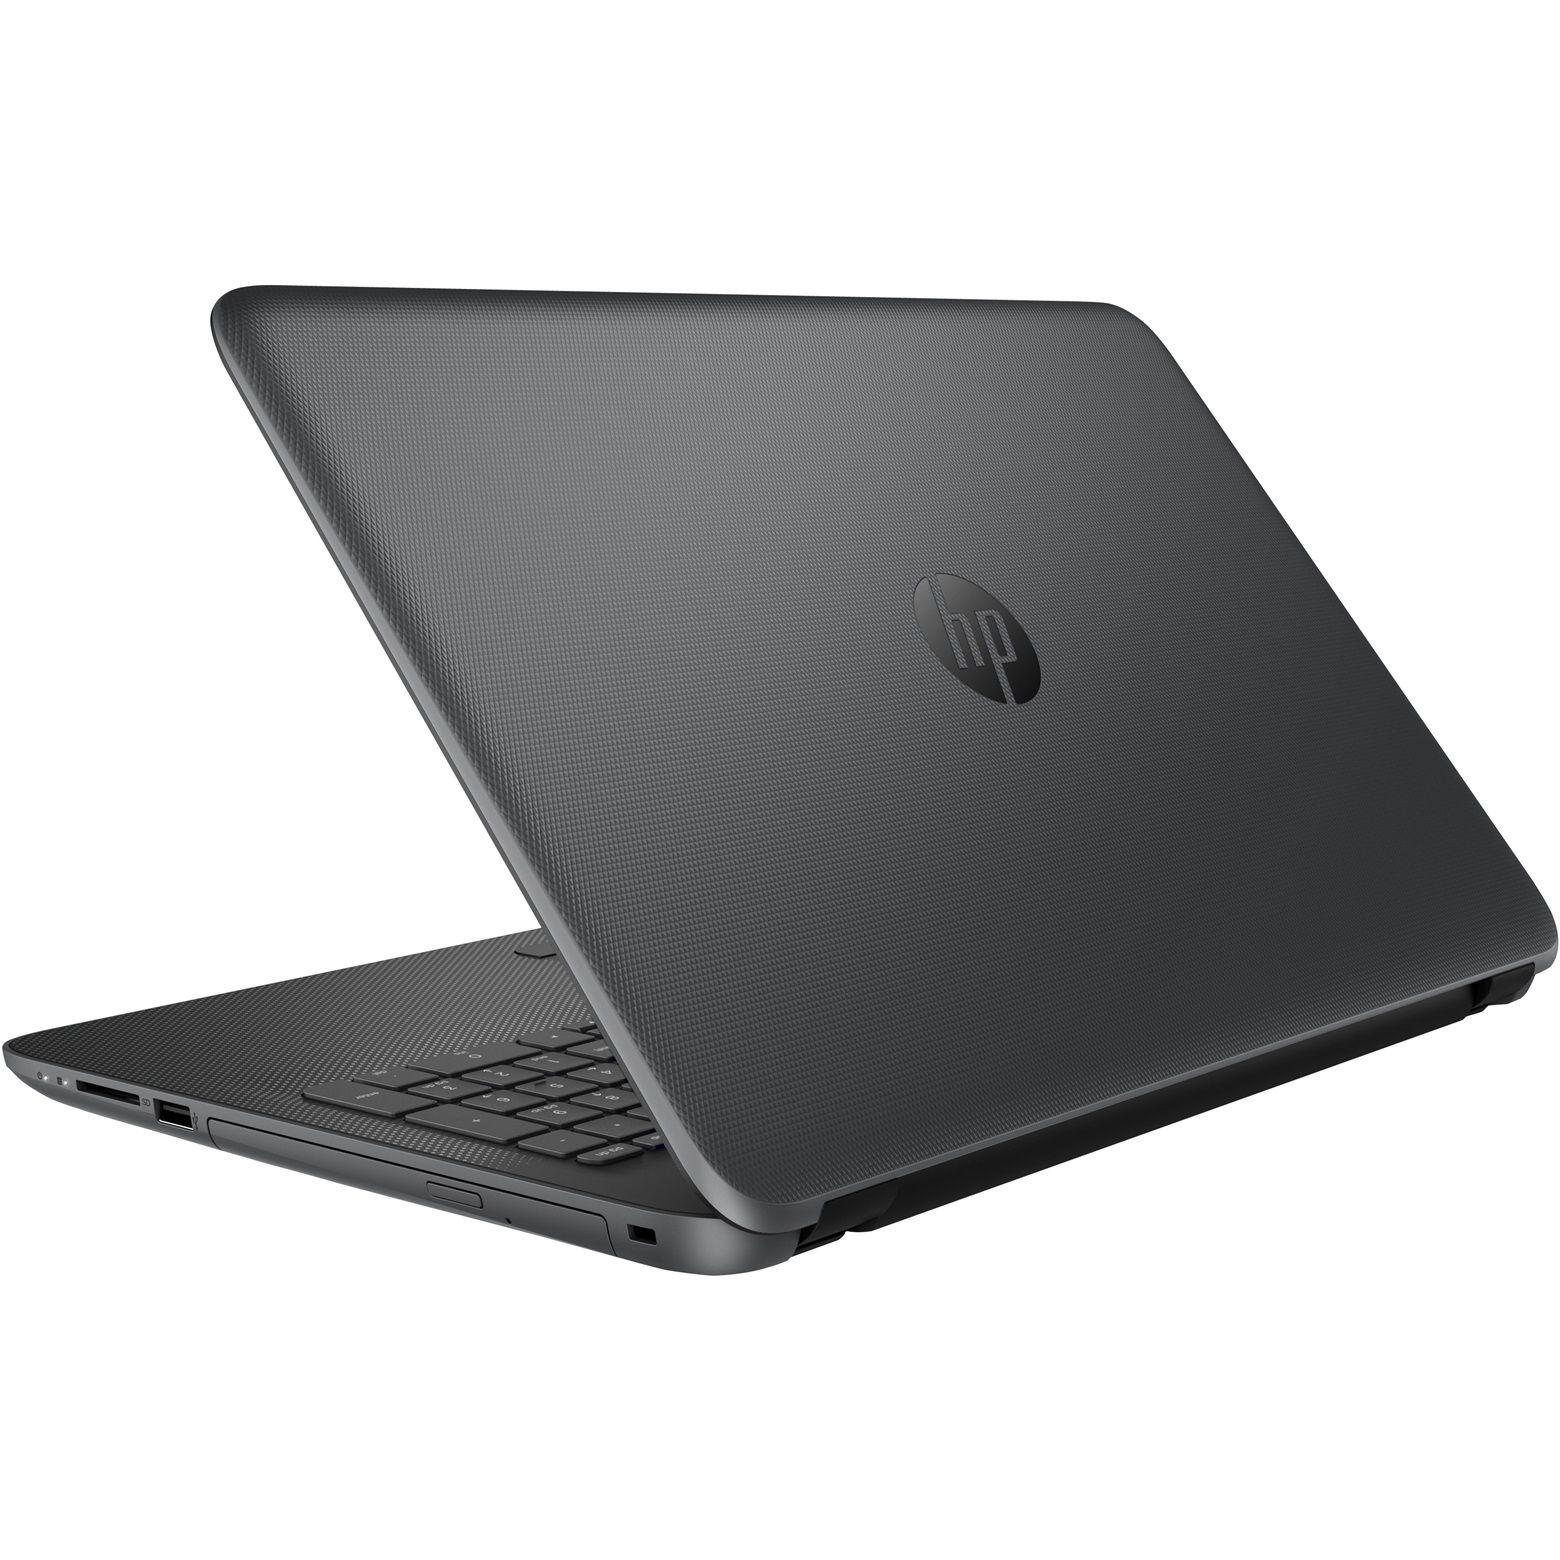 "Descriere Laptop HP 250 G4, 15.6"" HD, Procesor Intel® Core™ i3-4005U 1.70 GHz, 4GB, 500GB, FreeDos"